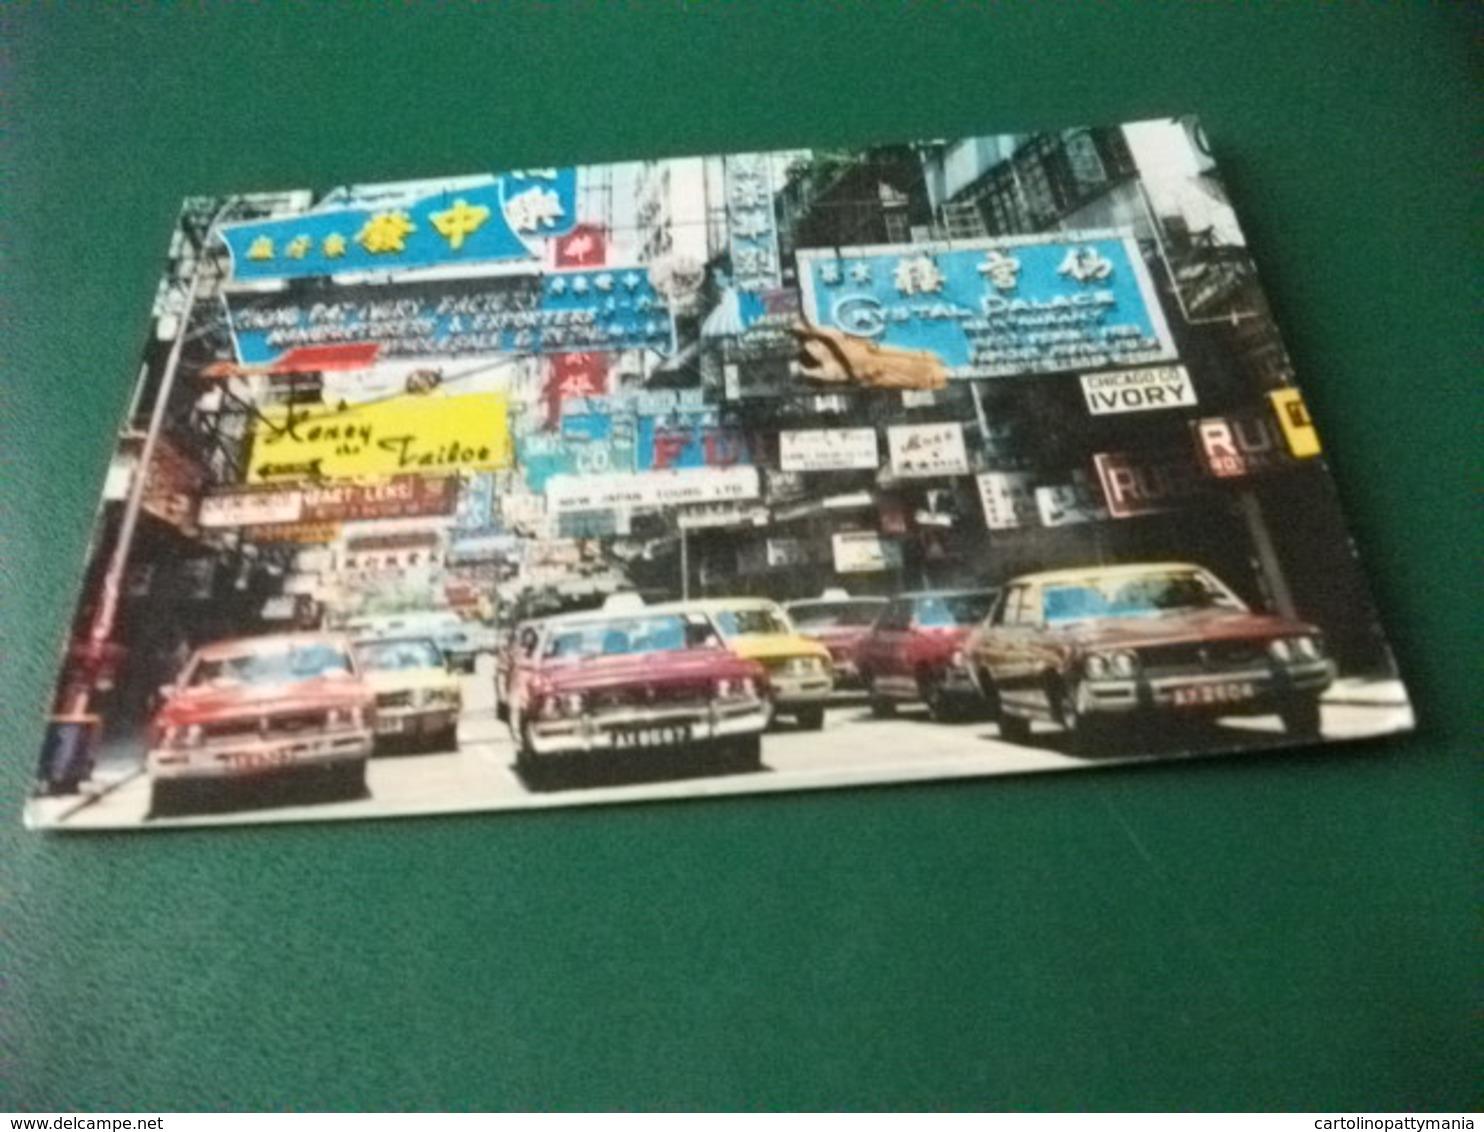 AUTO CAR PRIMO PIANO TAXI KOWLOON STREET IN HONG KONG - Taxi & Carrozzelle